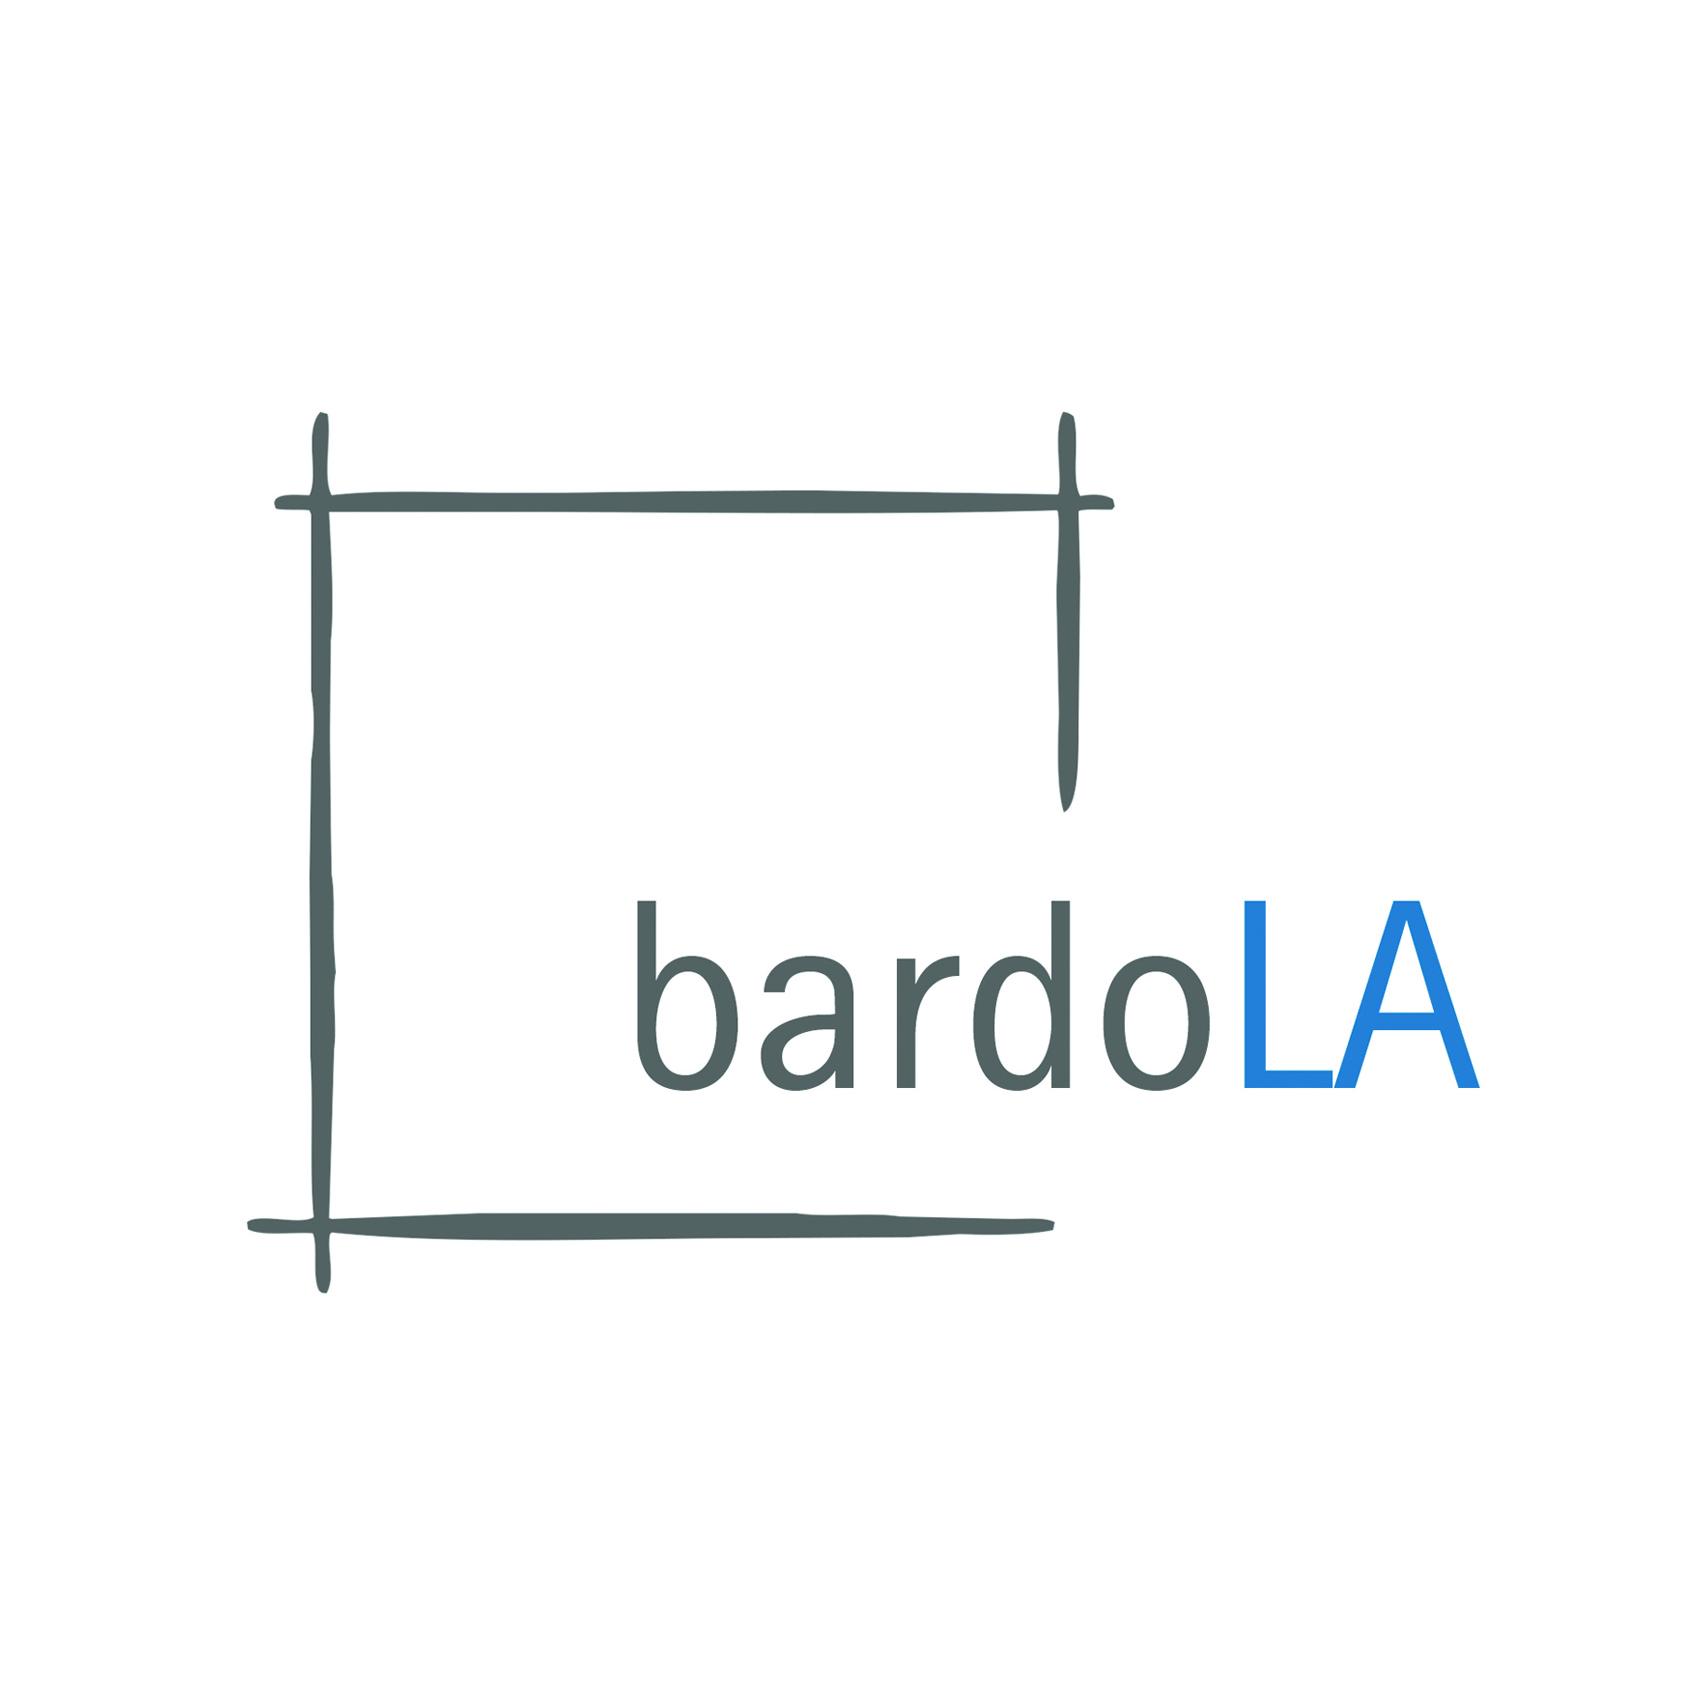 bardoLA_logo2018_brs.jpg